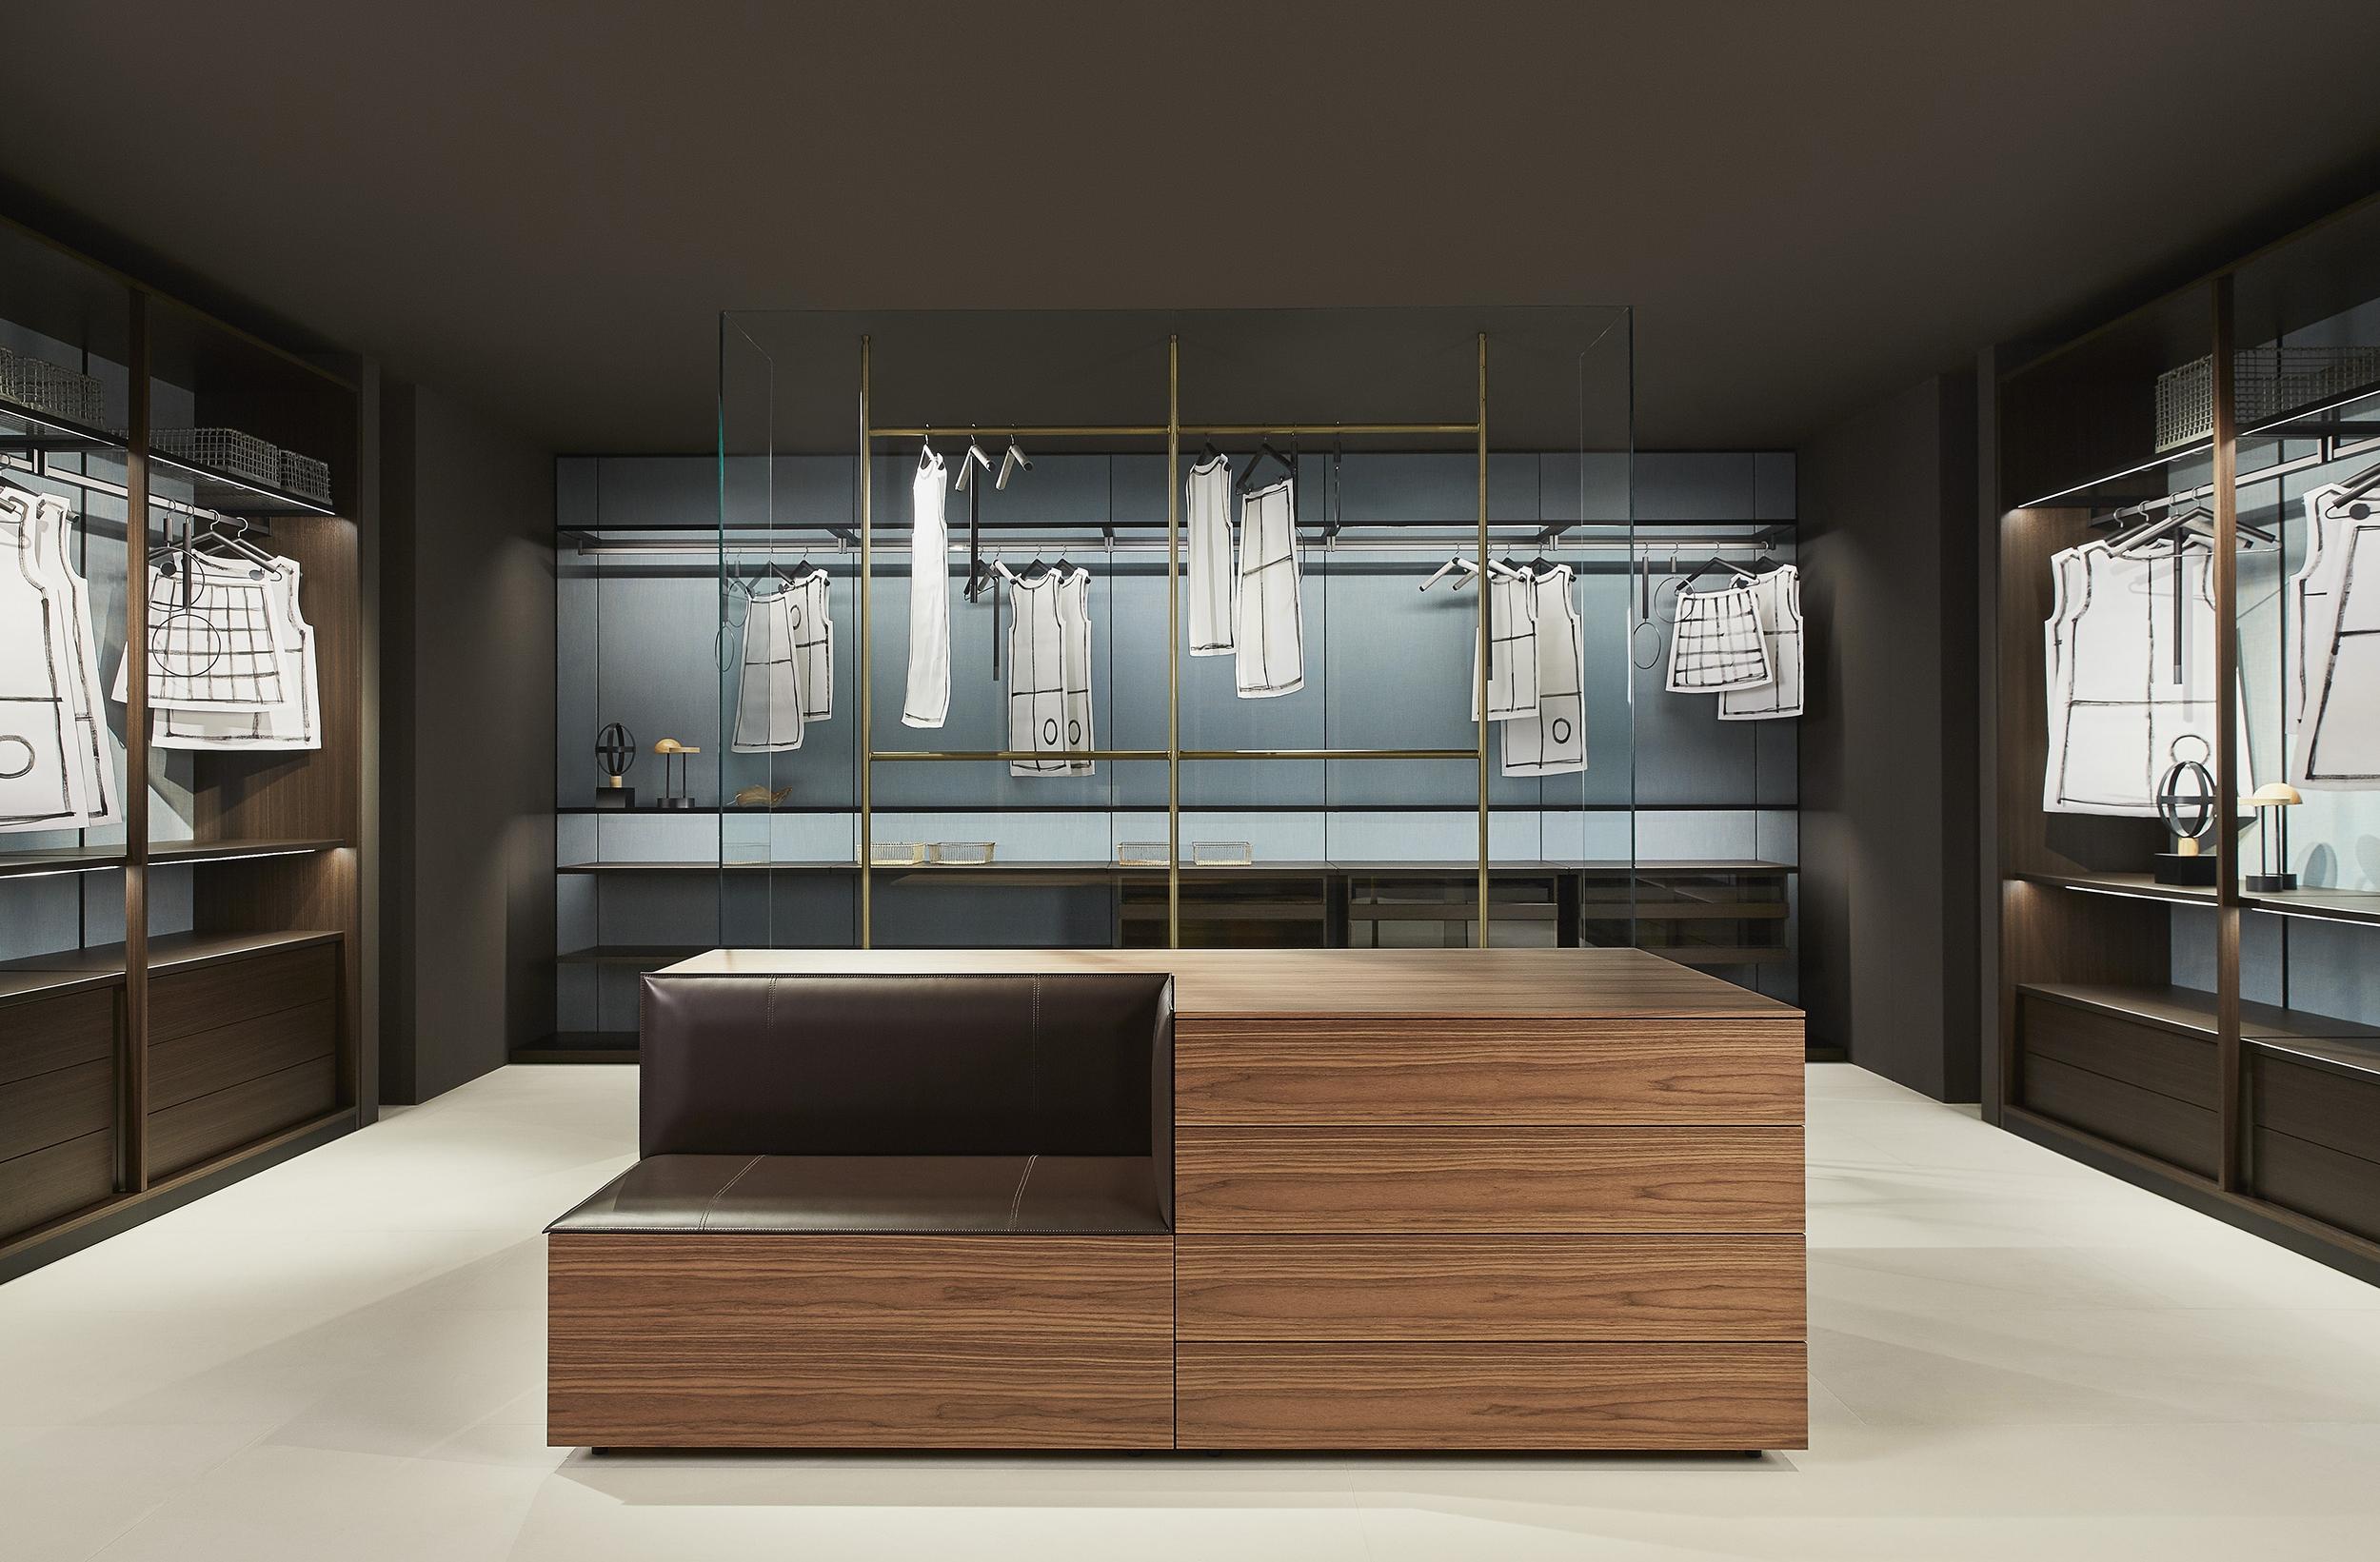 1_Porro_Salone2017_Storage Boiserie_Storage open wardrobes_Hub.jpg